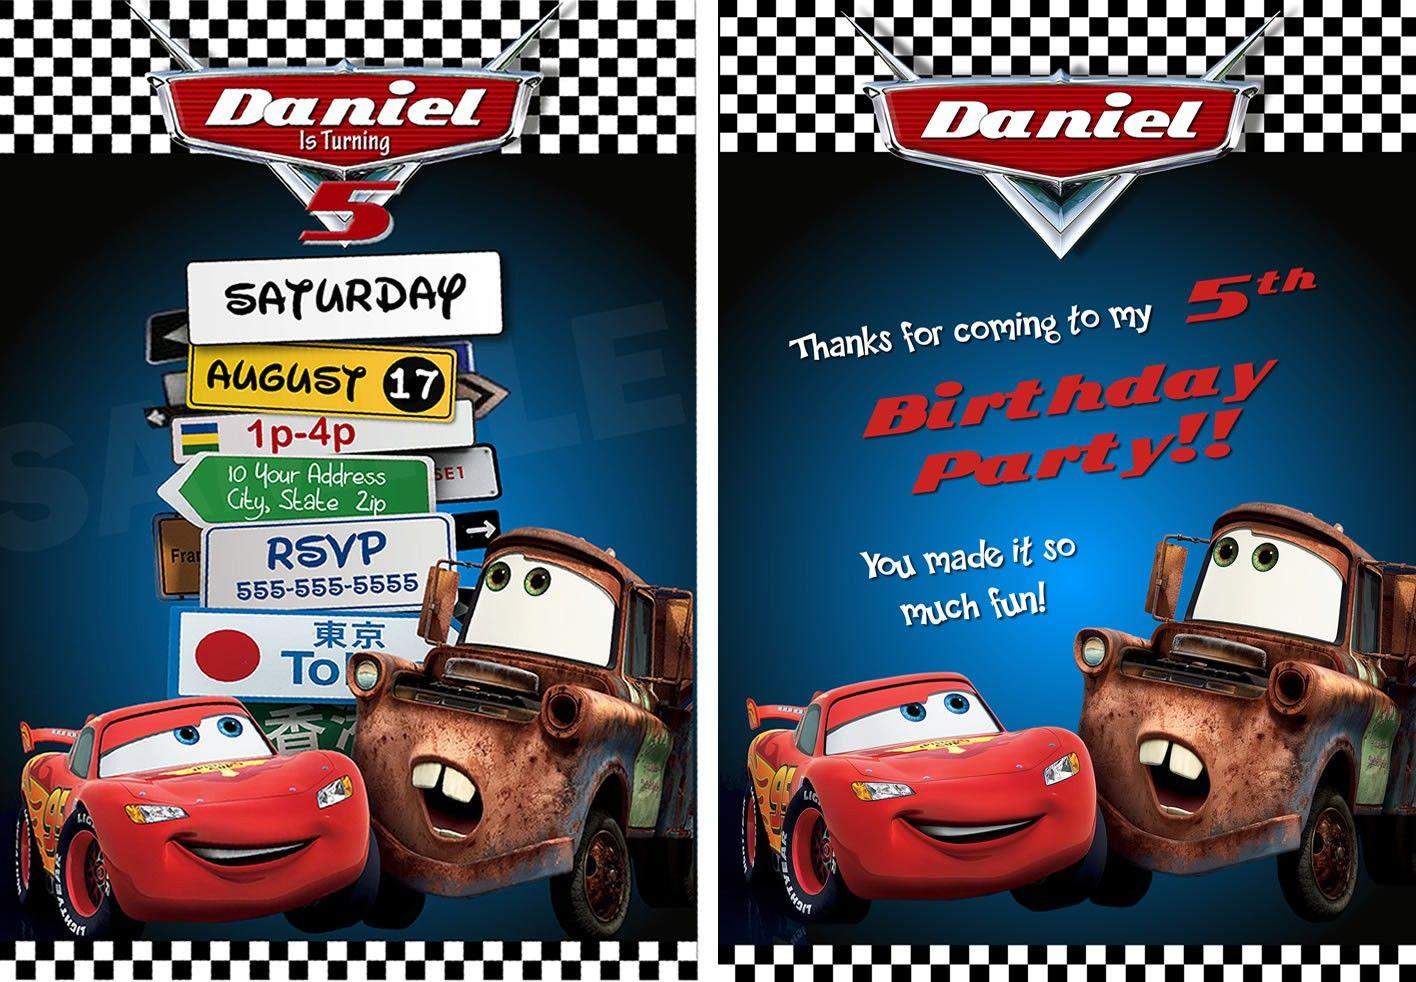 picture regarding Disney Cars Birthday Invitations Printable Free called Automobiles 2 Invites Printable Totally free Bubbys 3rd bday Disney